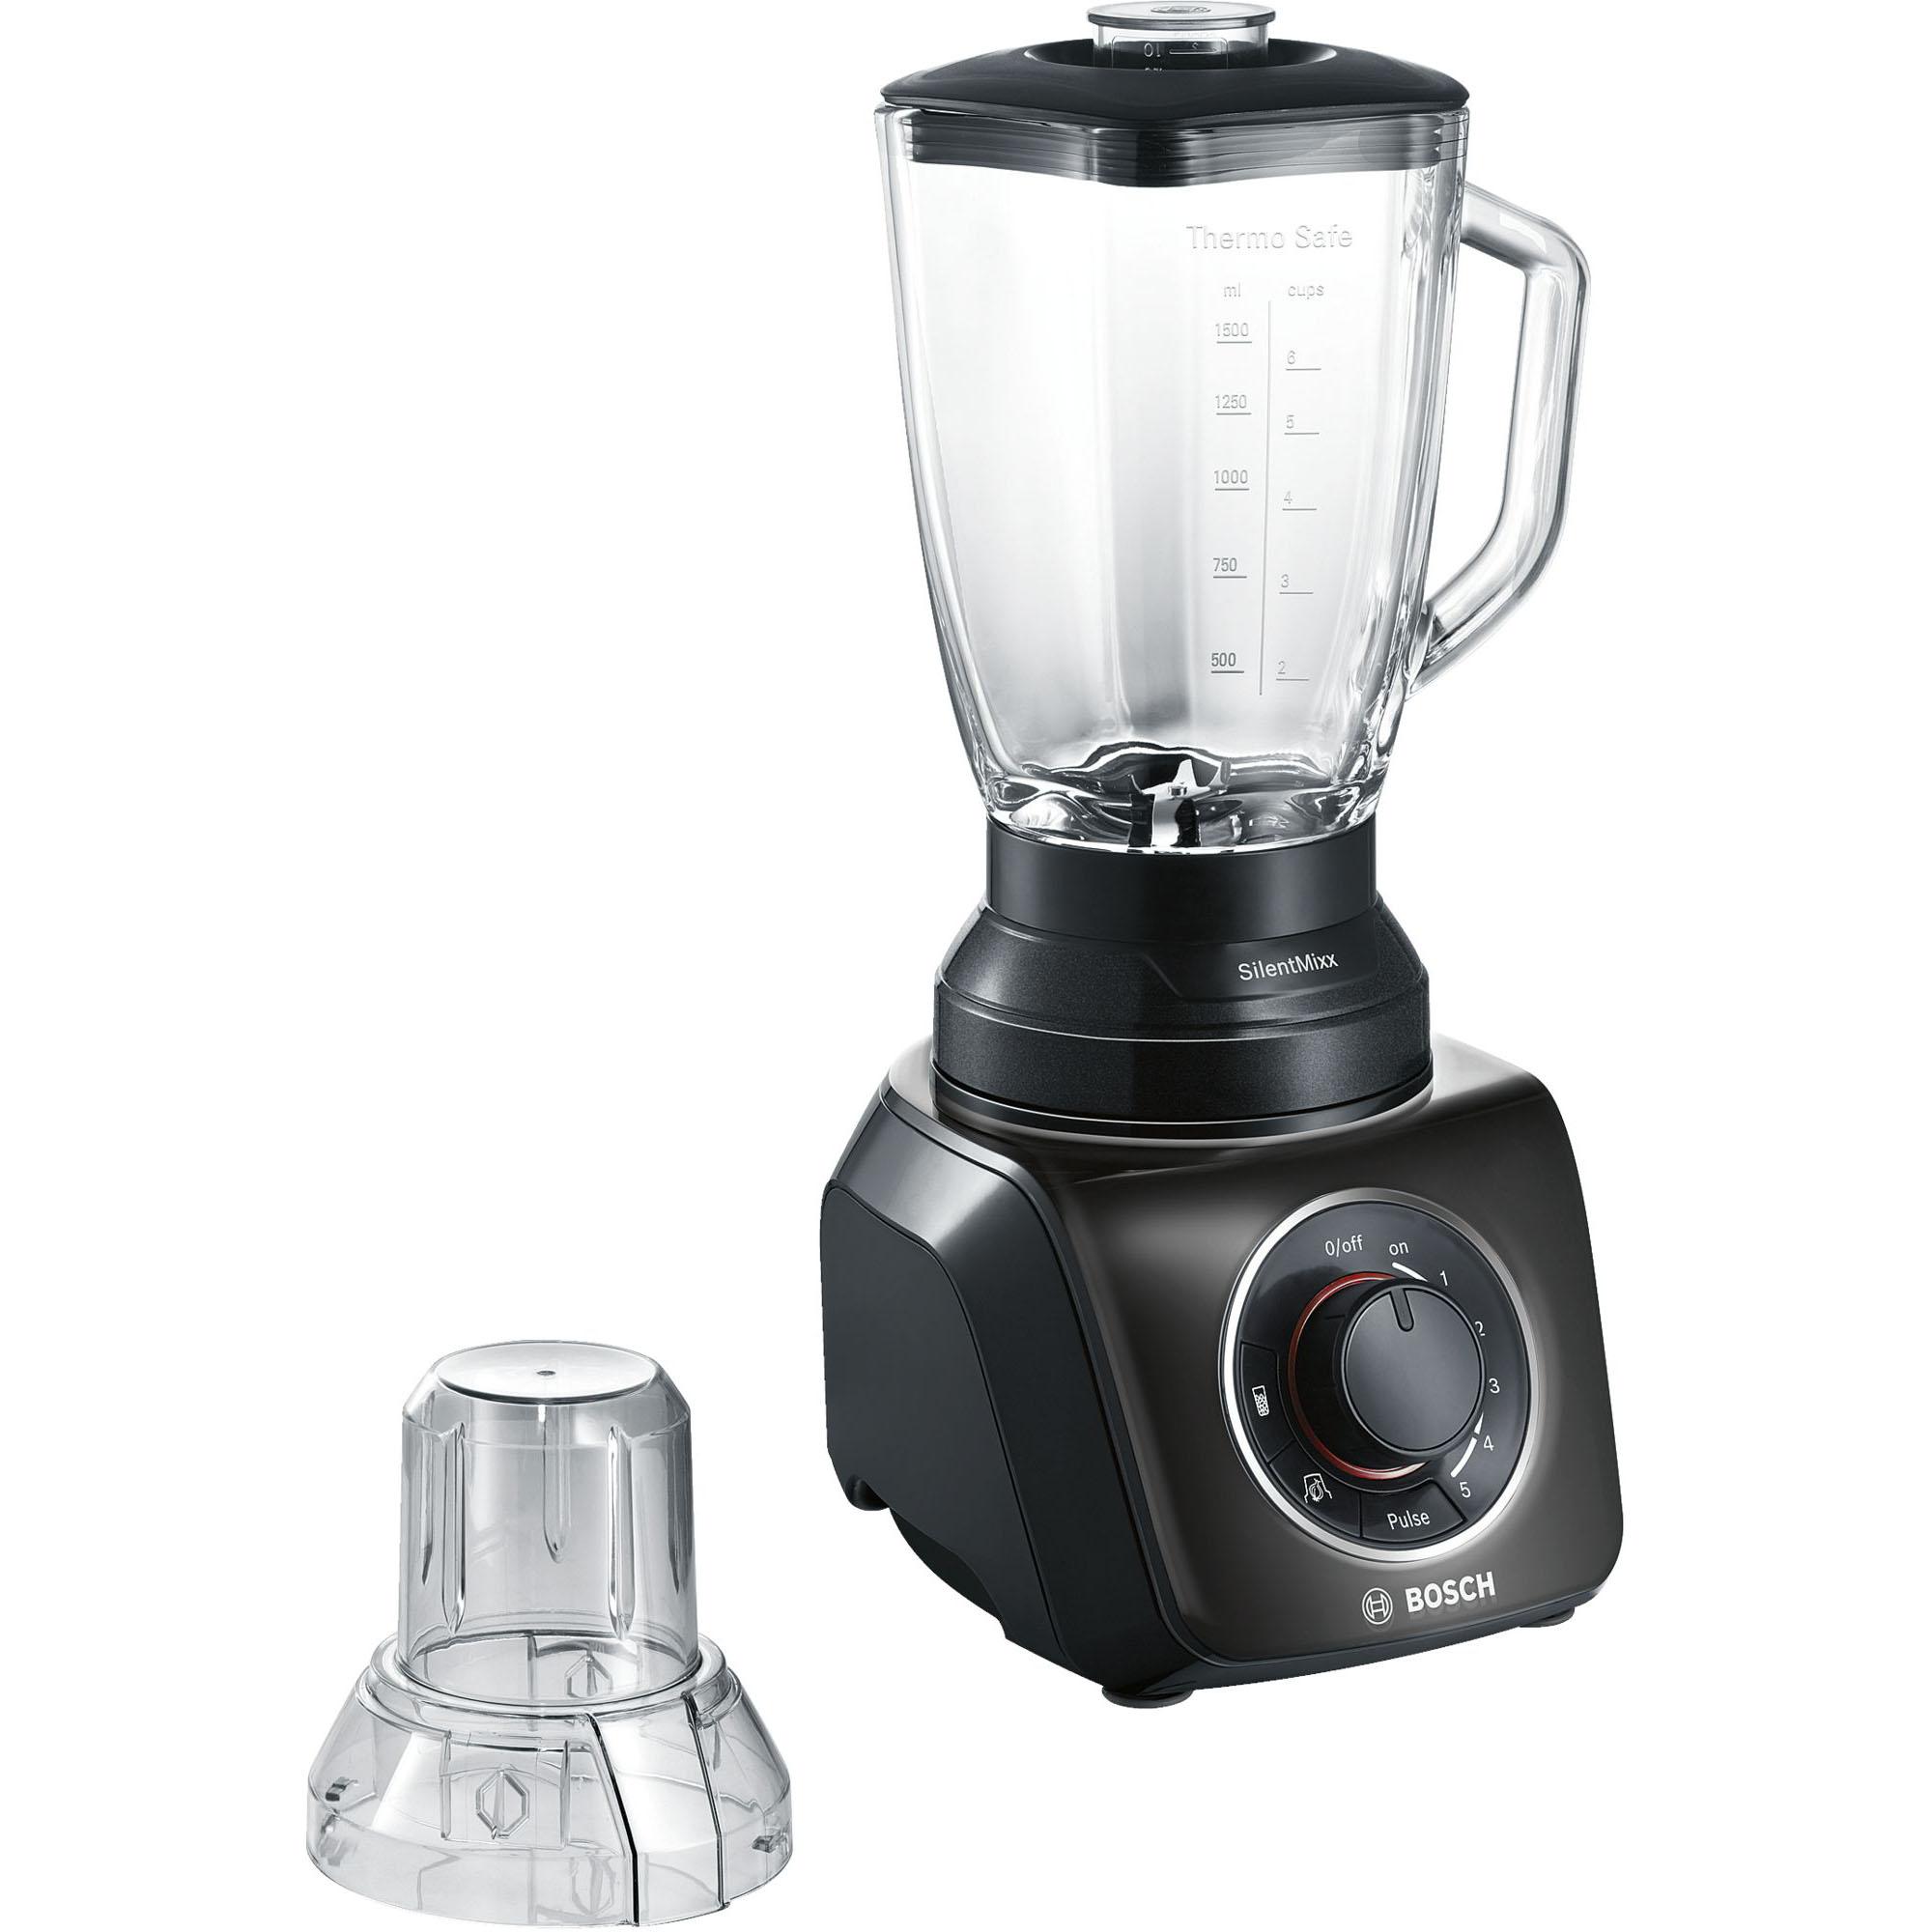 Blender Bosch - a good choice for the kitchen